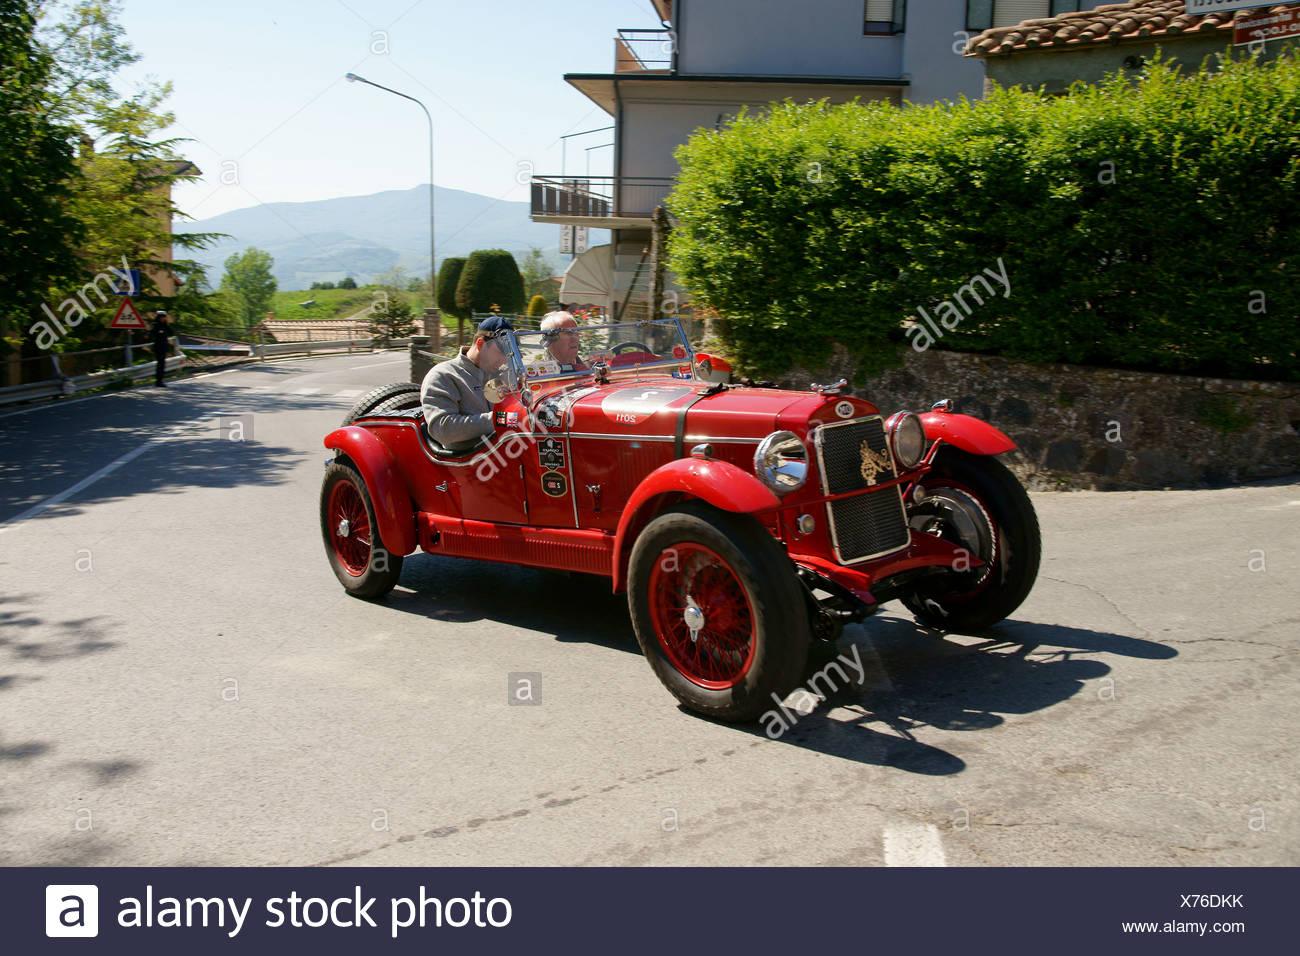 OM 665 Superba, 1929 3, Johann Georg Fendt, Corinna Fendt, vintage ...